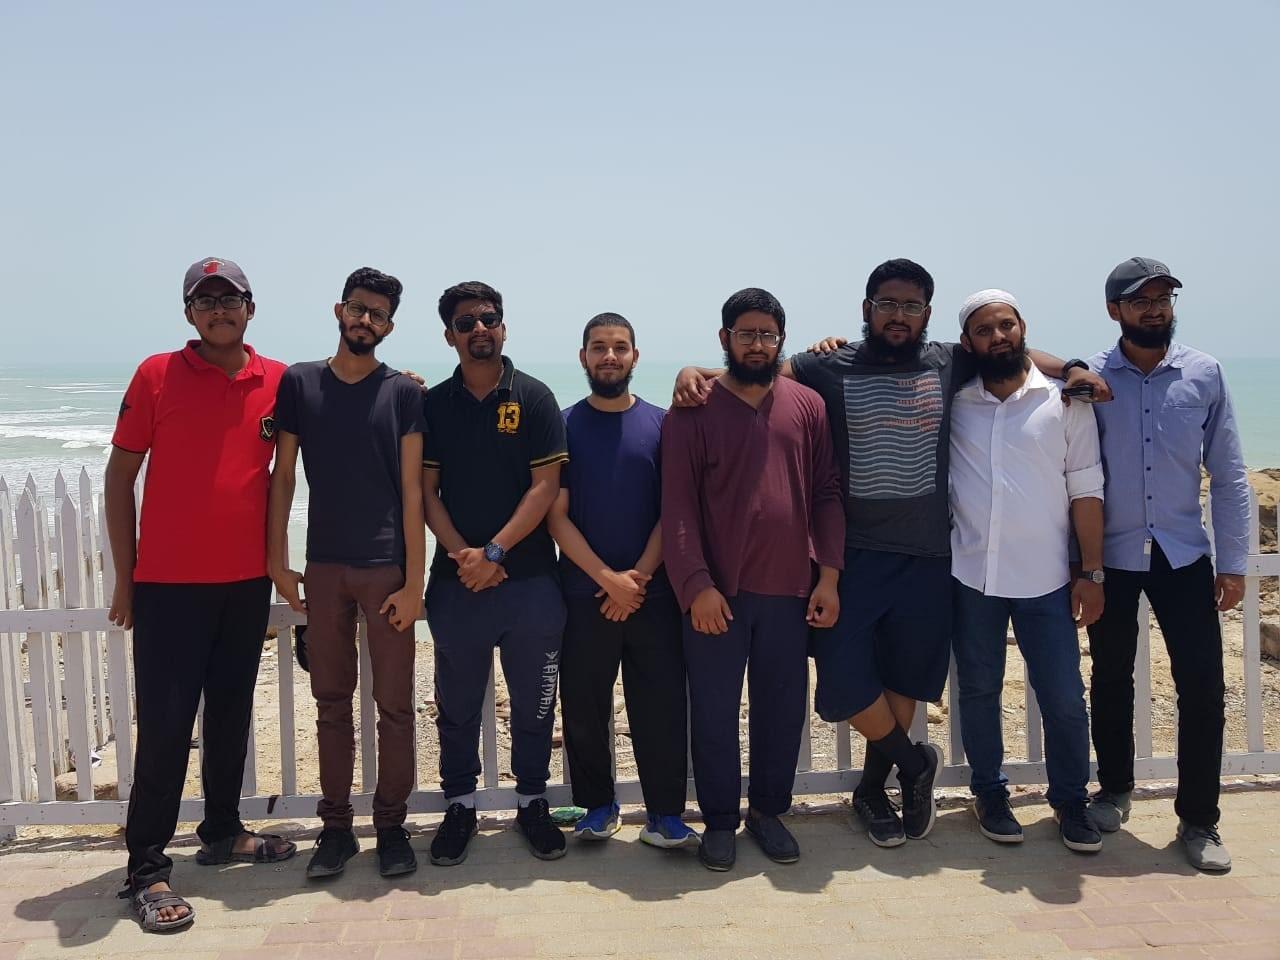 Habib, Ahmed, Usama, Obaid, Zubair, Anus, Zubair Kamali and Hamid enjoying the fresh breeze and the noise of waves at the view point of Kund Malir Beach.